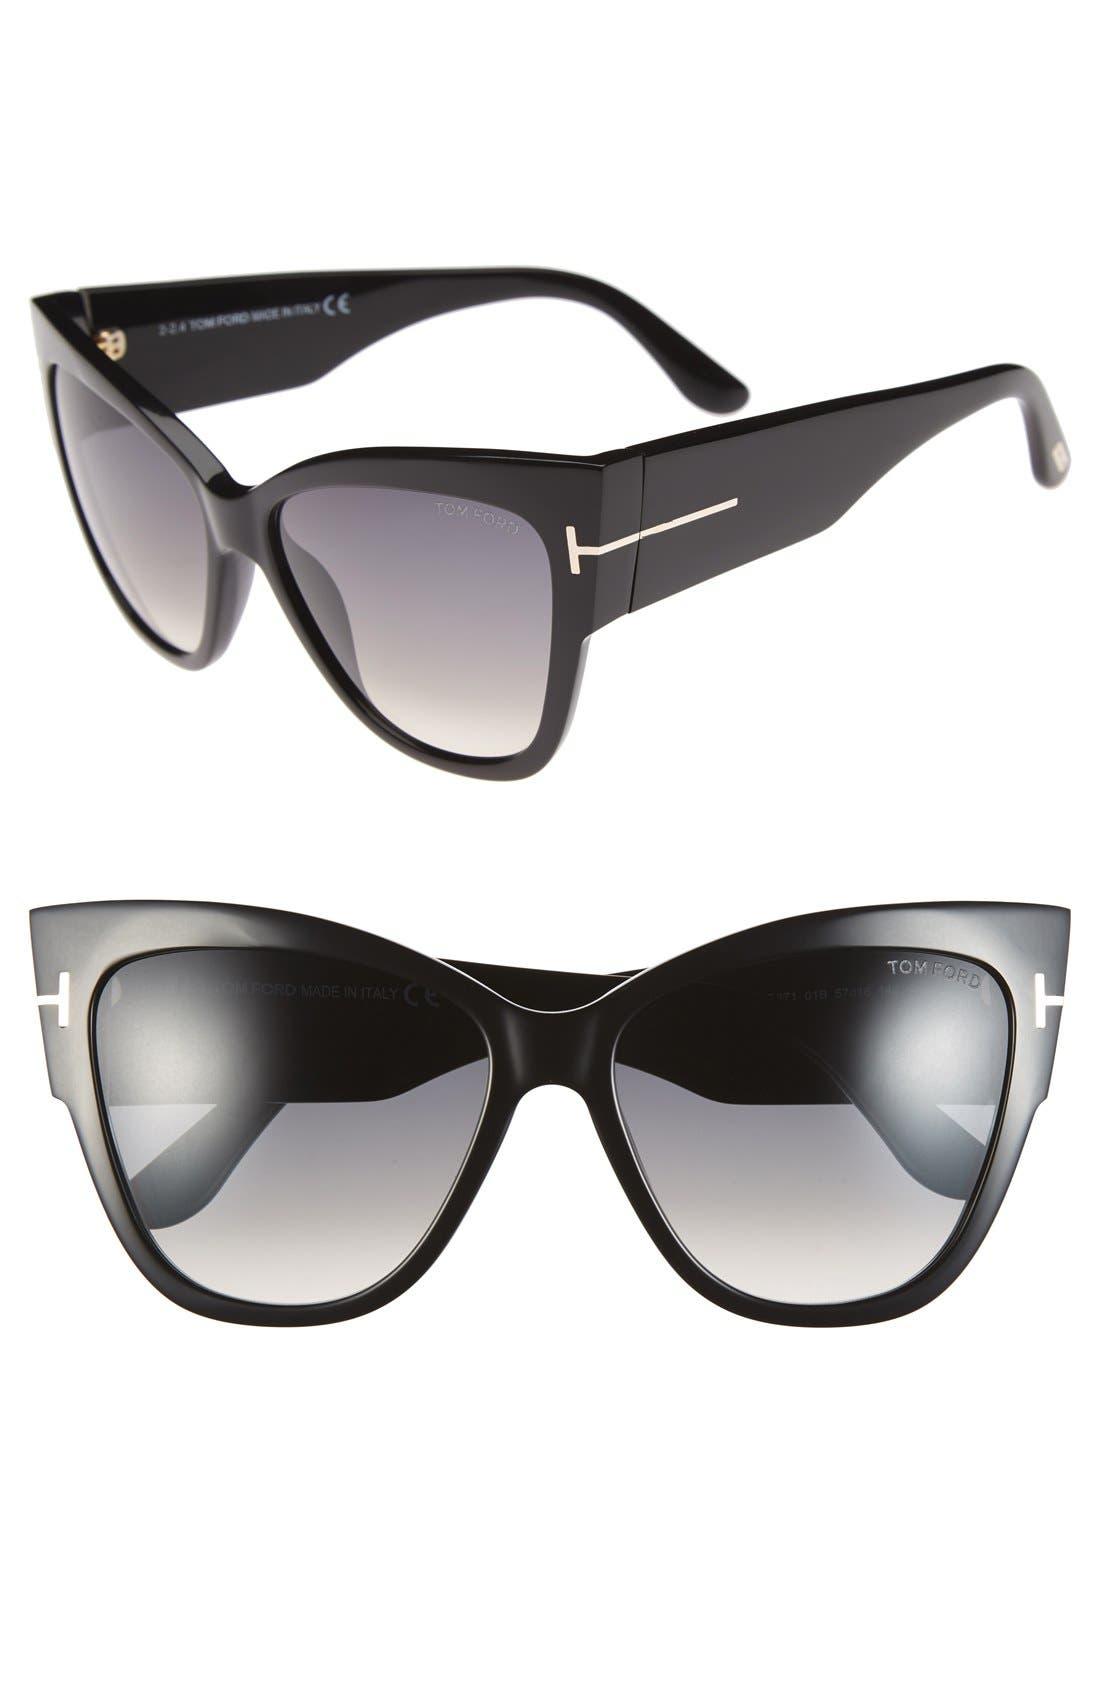 Anoushka 57mm Gradient Cat Eye Sunglasses,                         Main,                         color, Shiny Black/ Gradient Grey